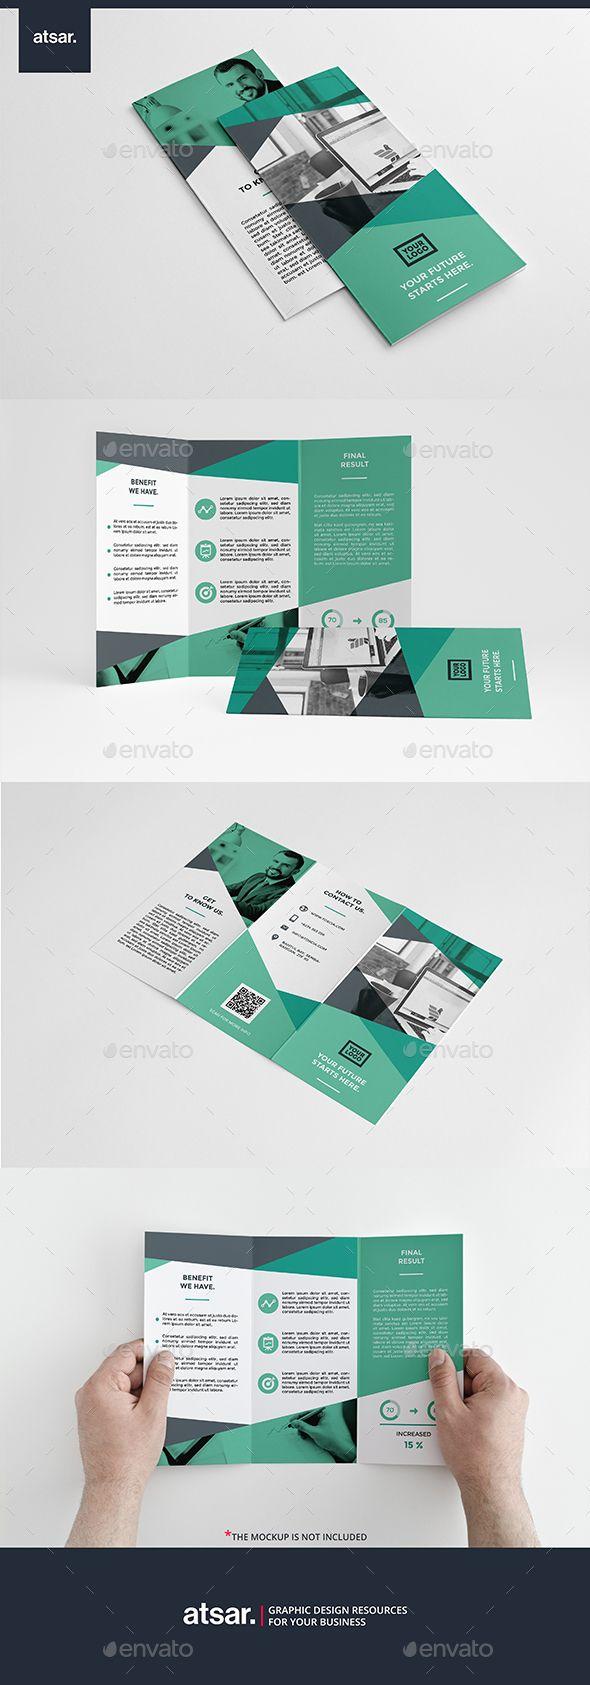 Toscia Trifold Brochure Template InDesign INDD #design Download: http://graphicriver.net/item/toscia-trifold-brochure/13570643?ref=ksioks